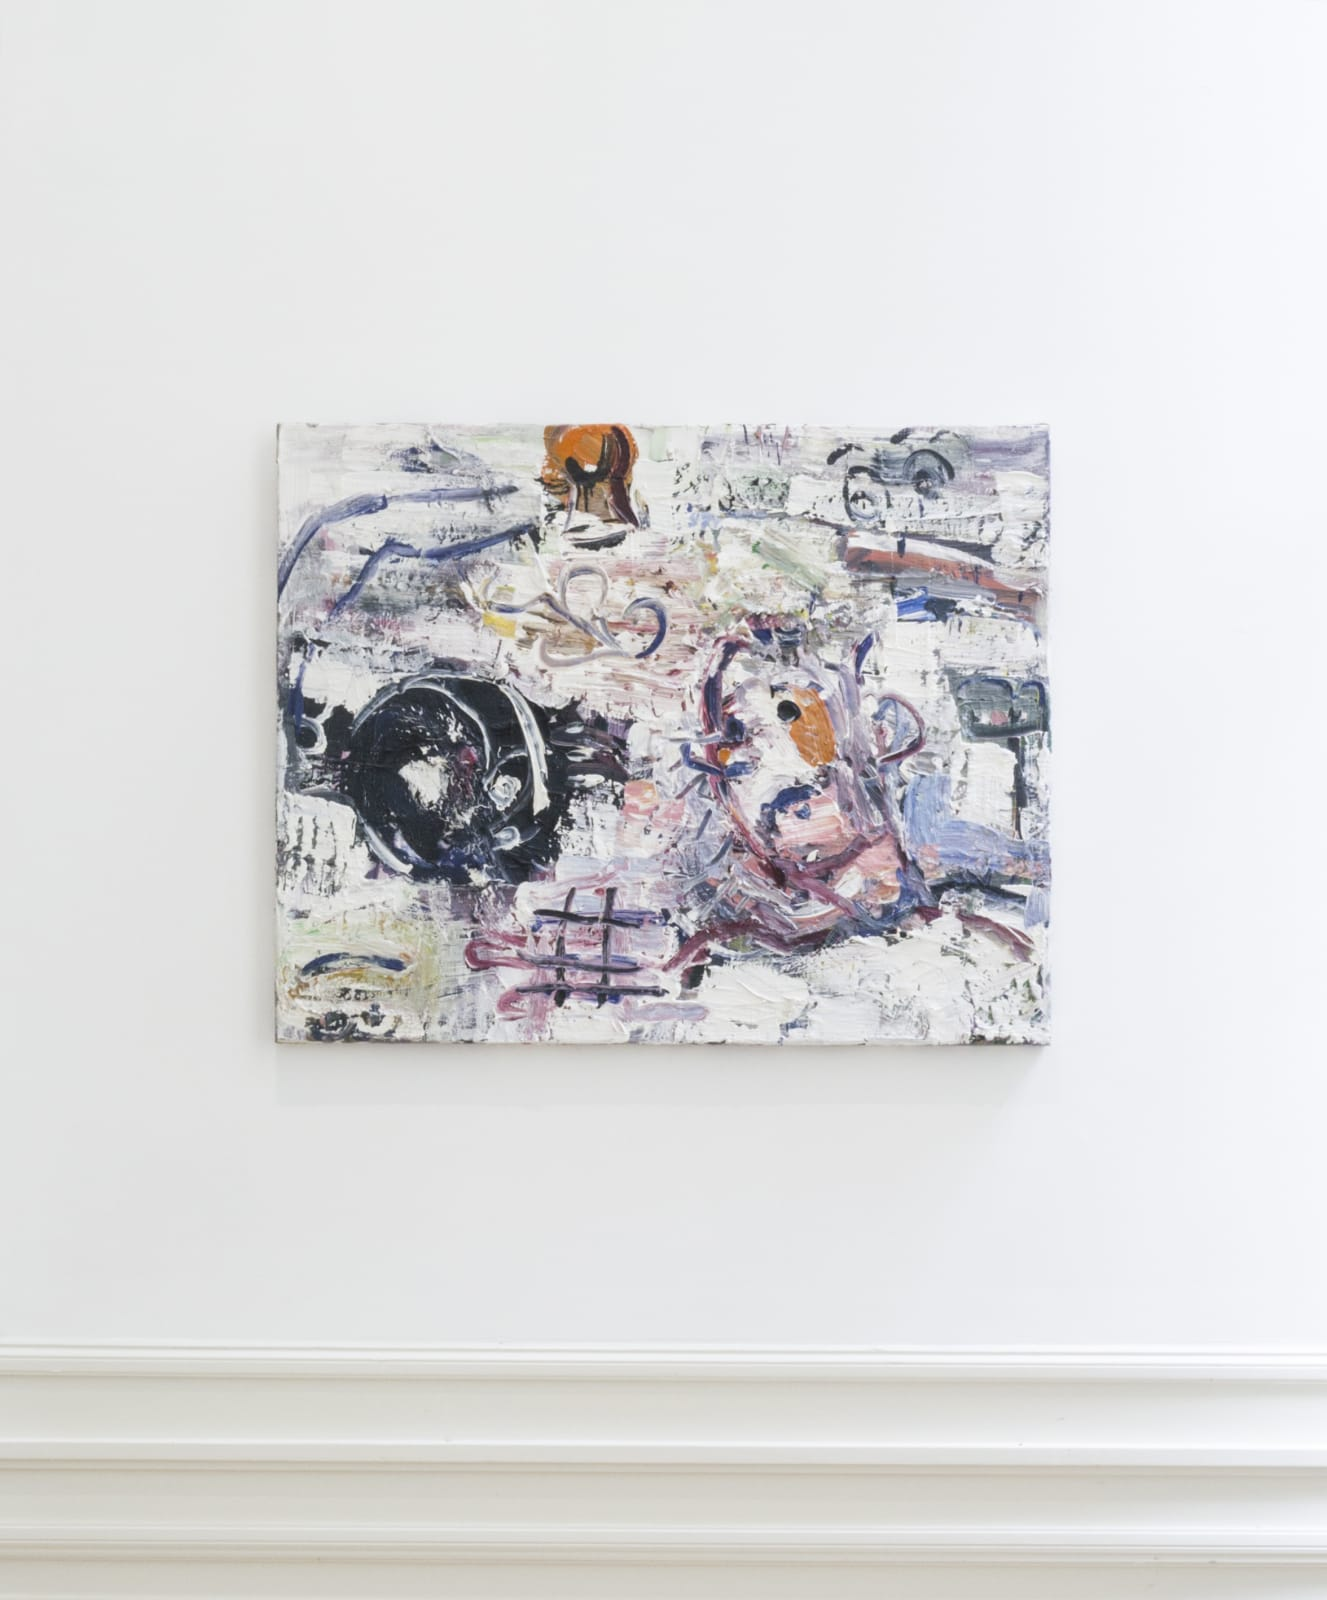 Matthew Day Jackson & Philippe Vandenberg